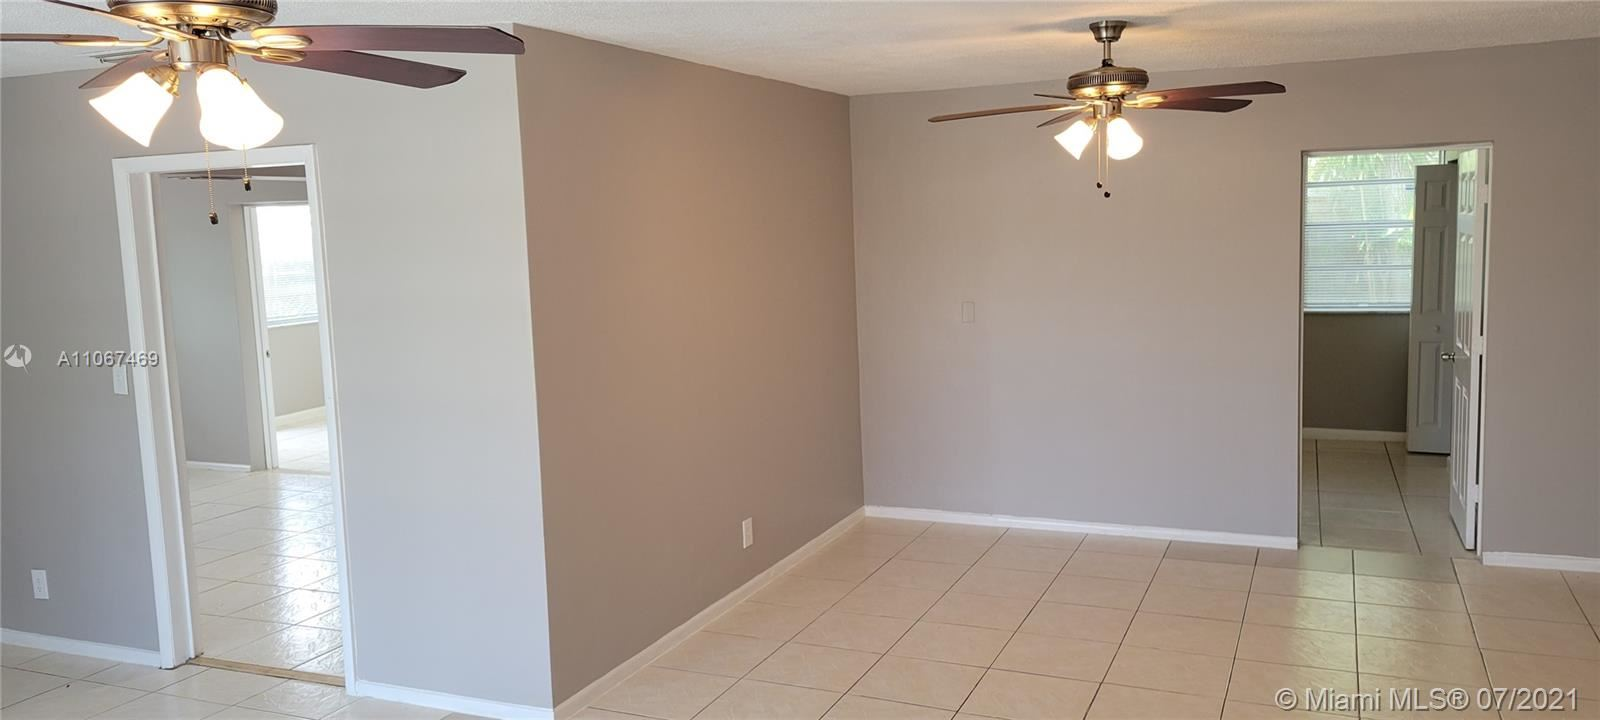 Photo of 4420 NW 25th St, Lauderhill, FL 33313 (MLS # A11067469)